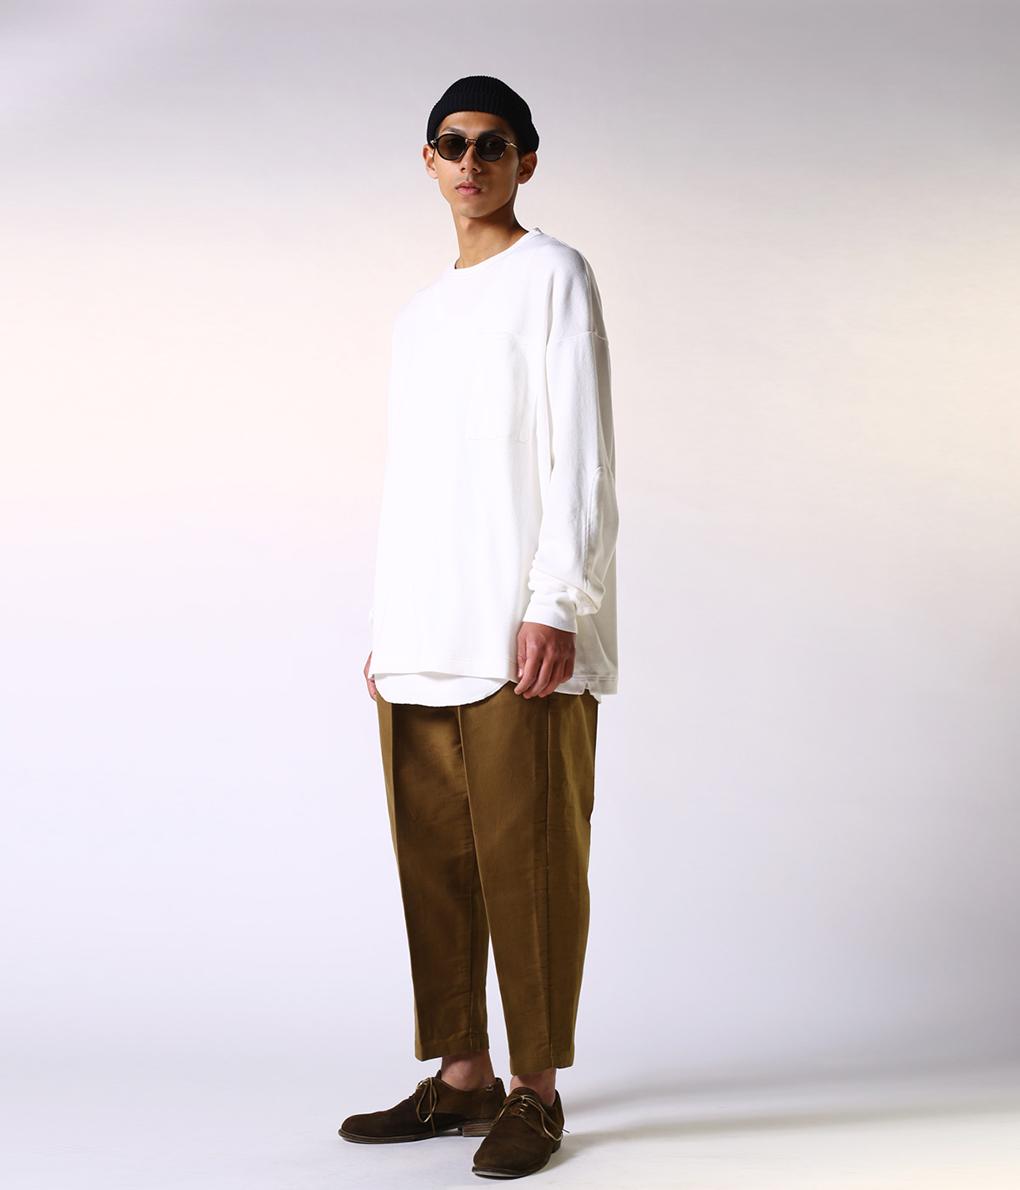 GOLD 東洋エンタープライズ / ゴールド : LIGHT THERMAL L/S BIG POCKET T-SHIRT / 全2色 : ライトサーマル ロングスリーブ ビッグポケット Tシャツ 東洋 TOYO トーヨー トーヨーエンタープライズ : GL68137 【MUS】